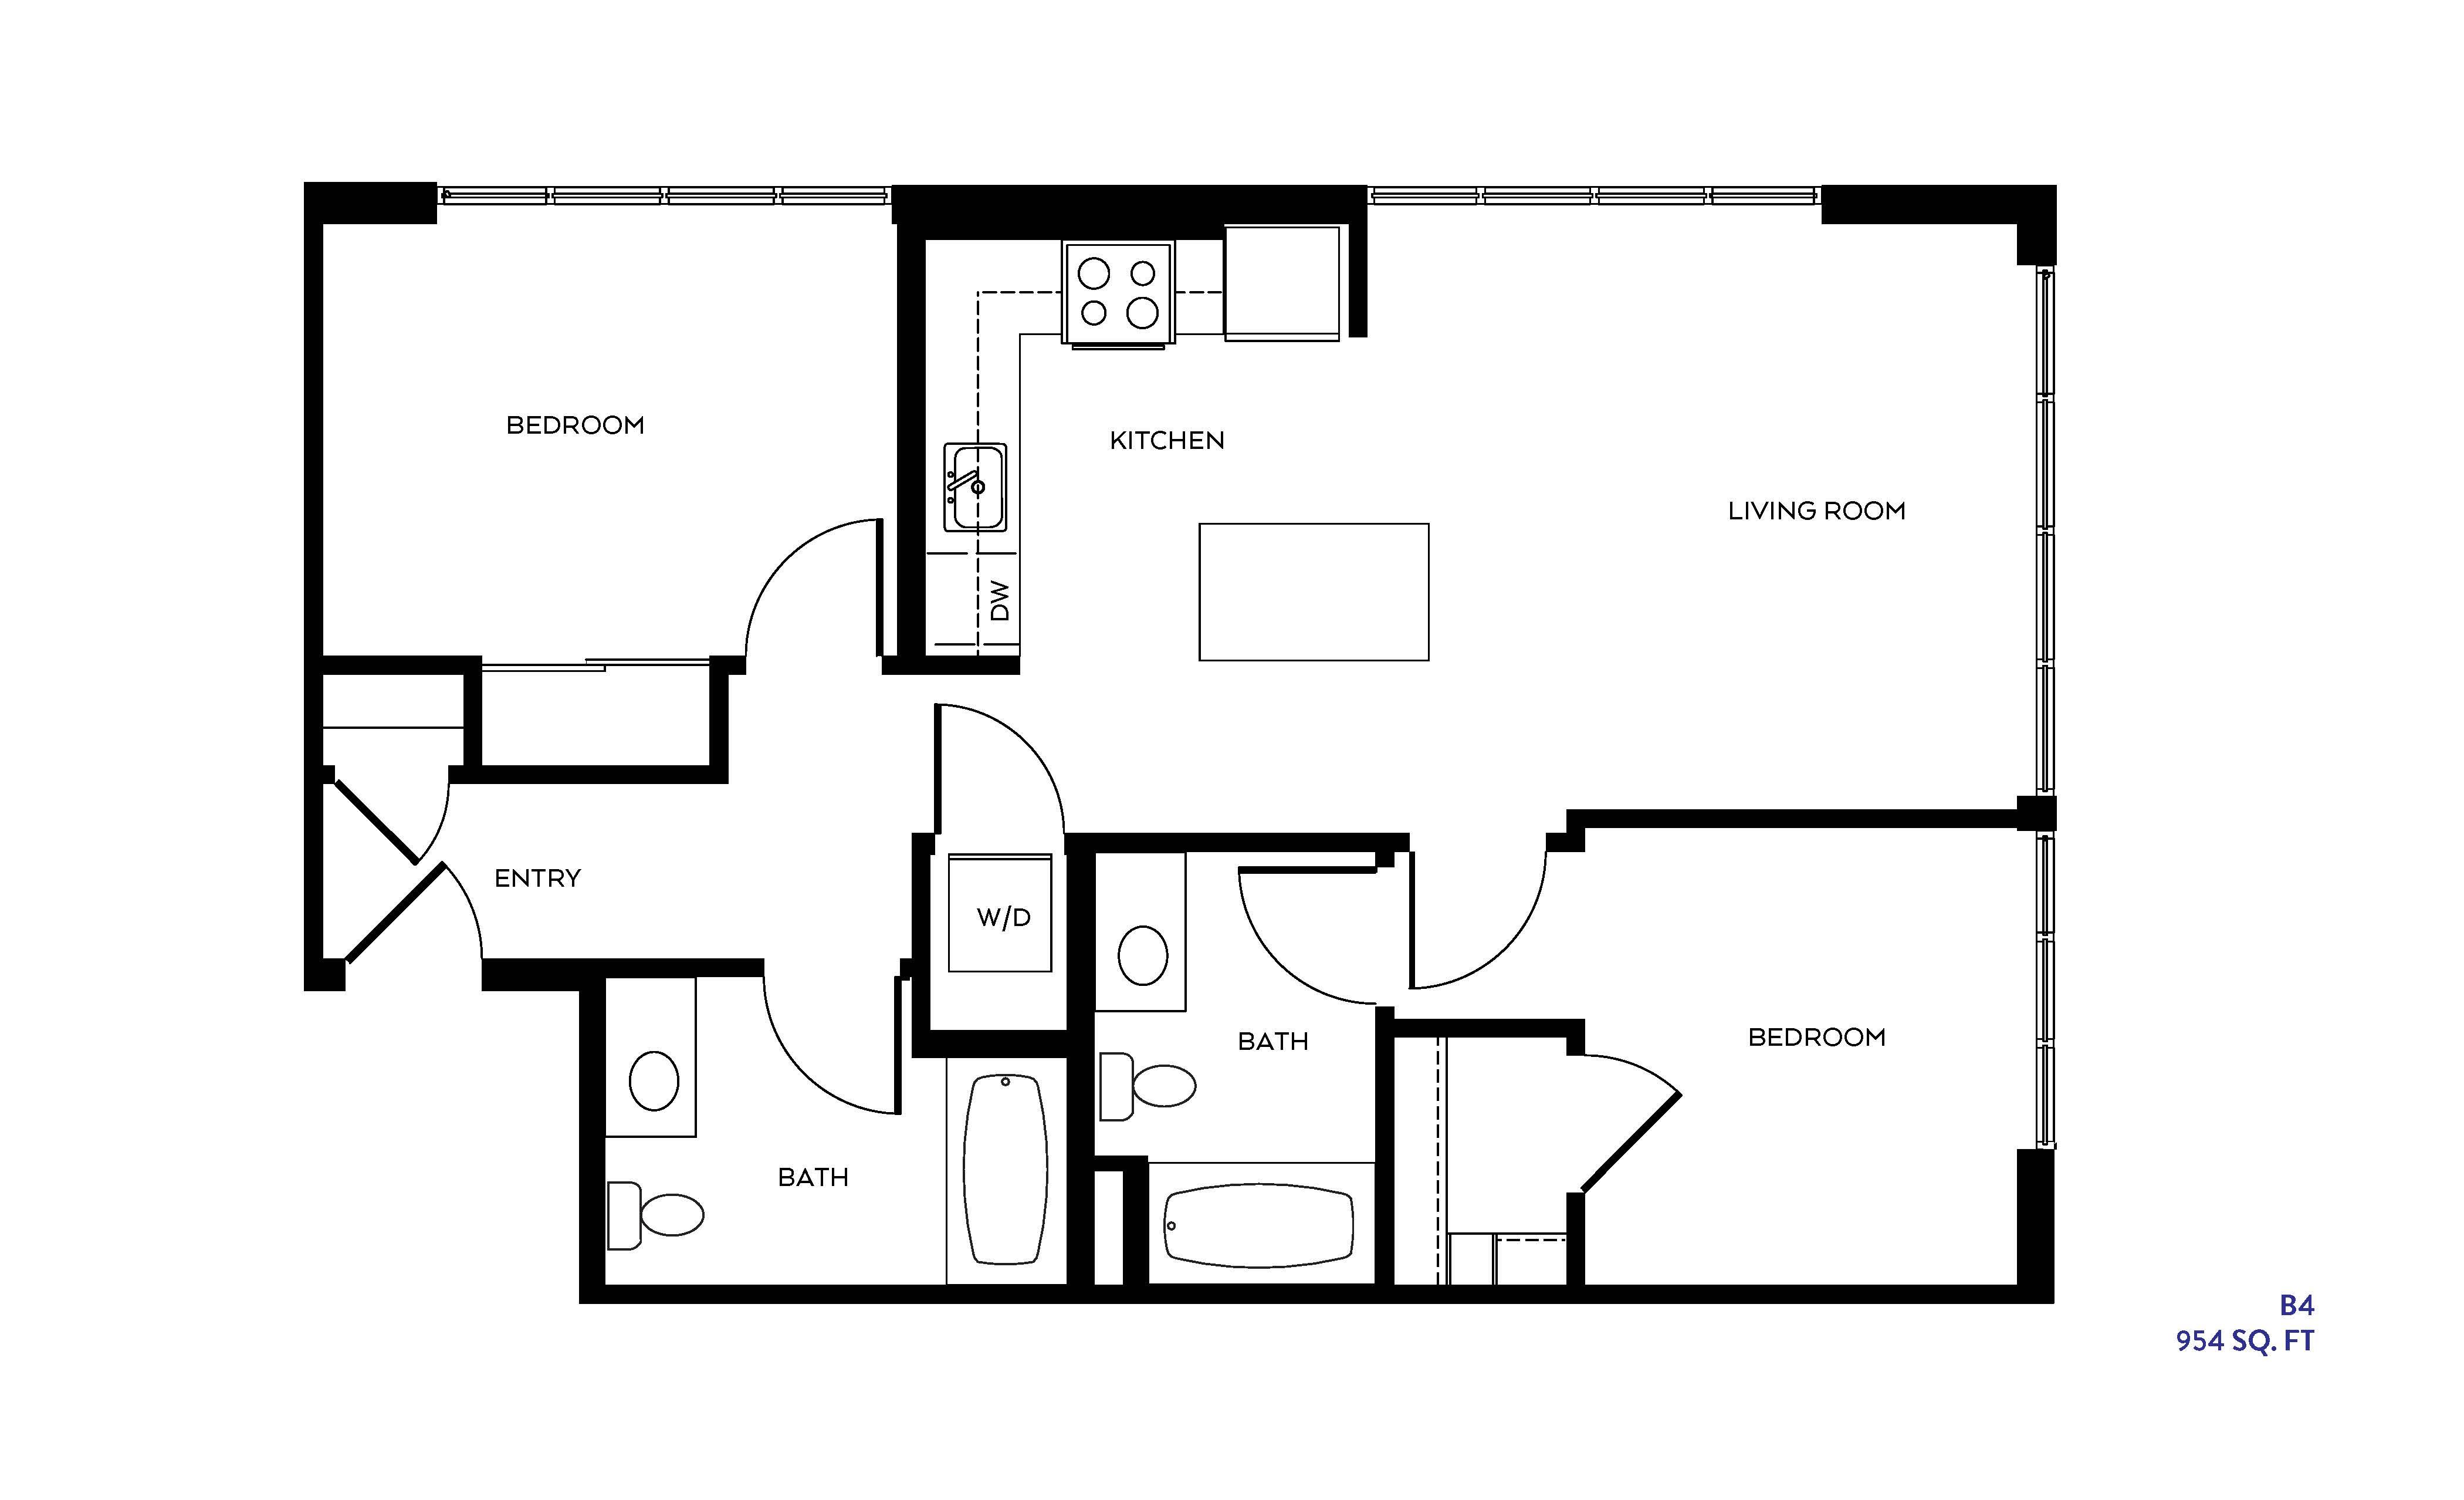 The B4 floor plan